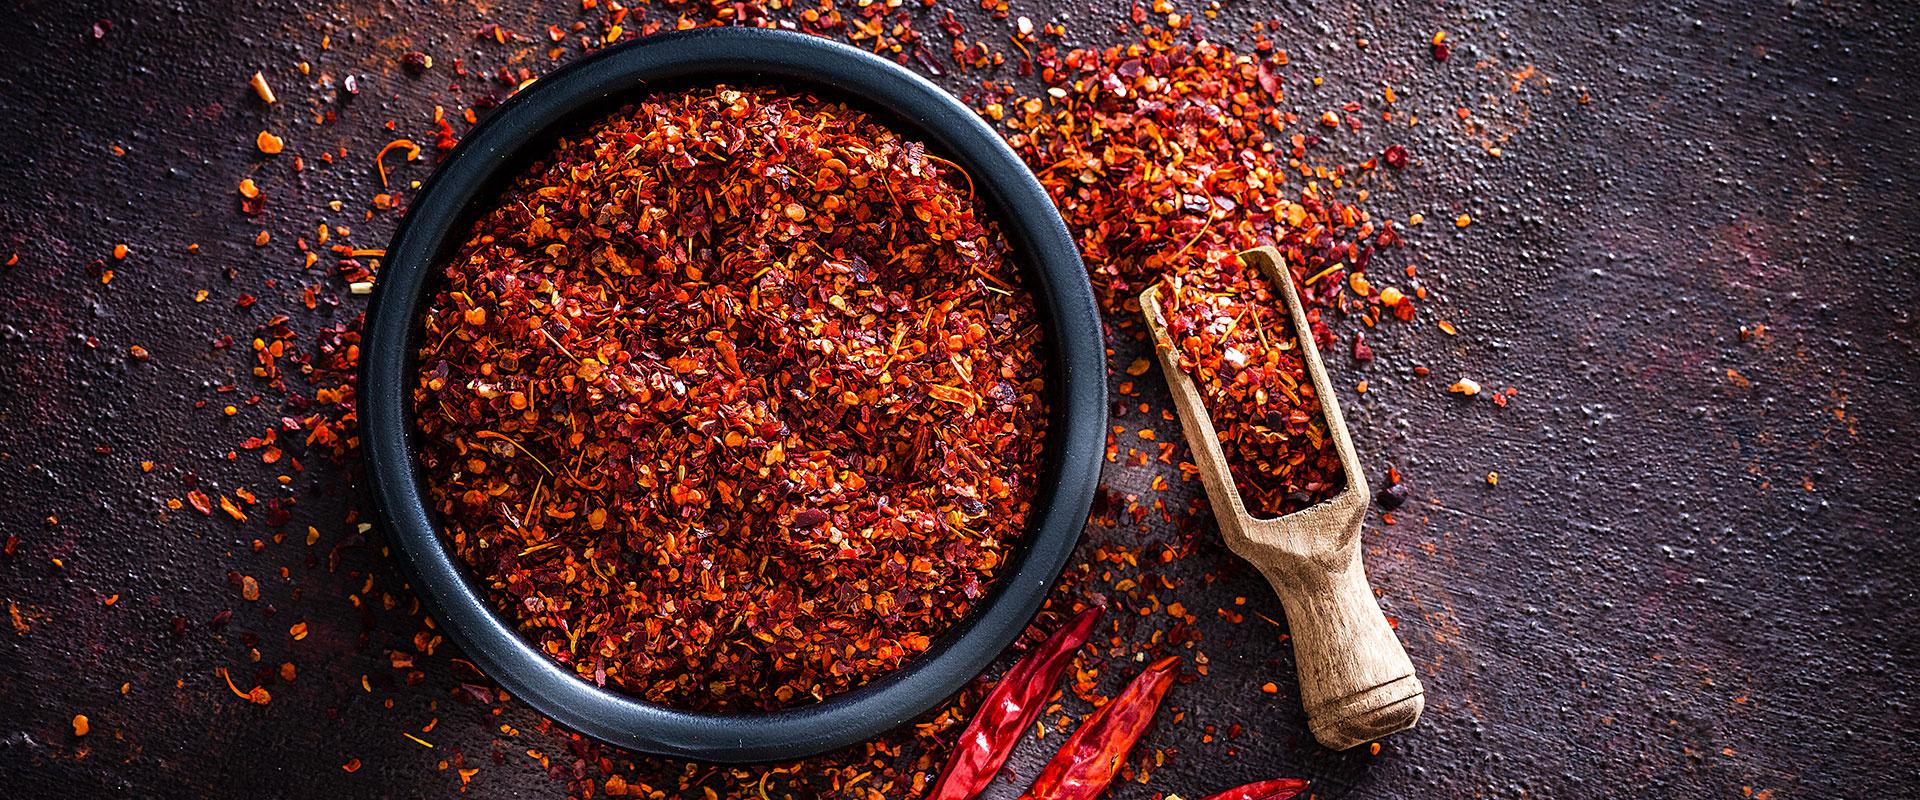 chili pehely fogyás